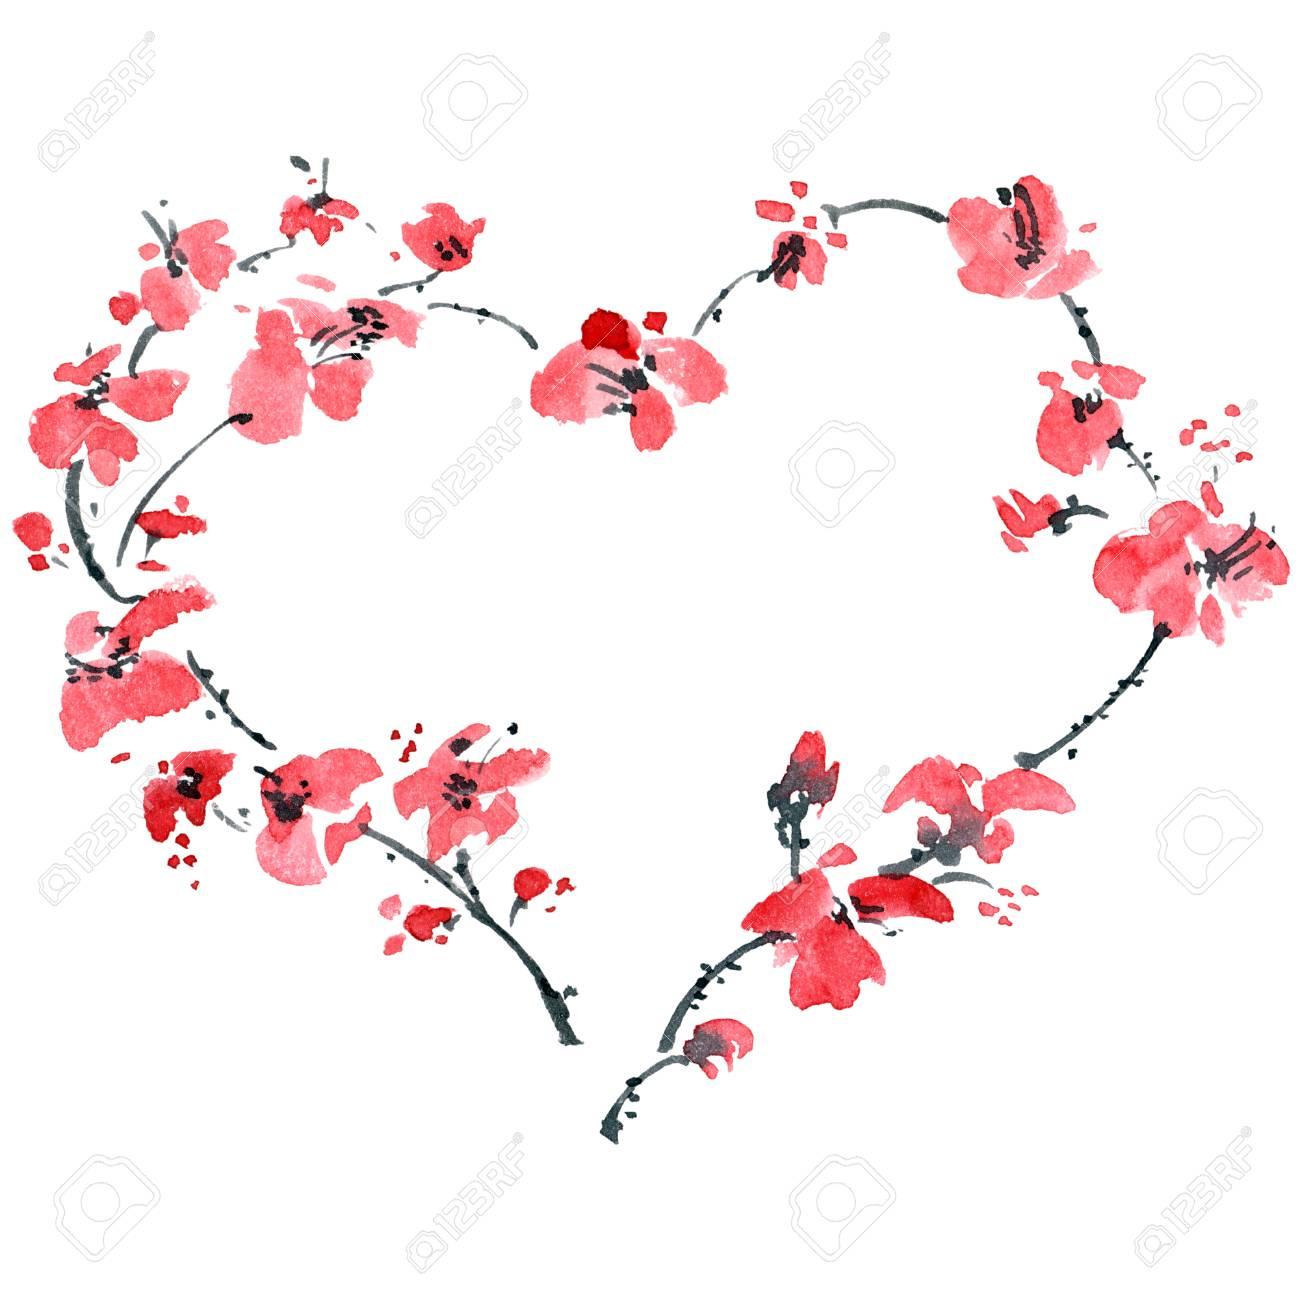 Aquarell Gemalt Floralen Herzen Illustration Fur Romantische Karten